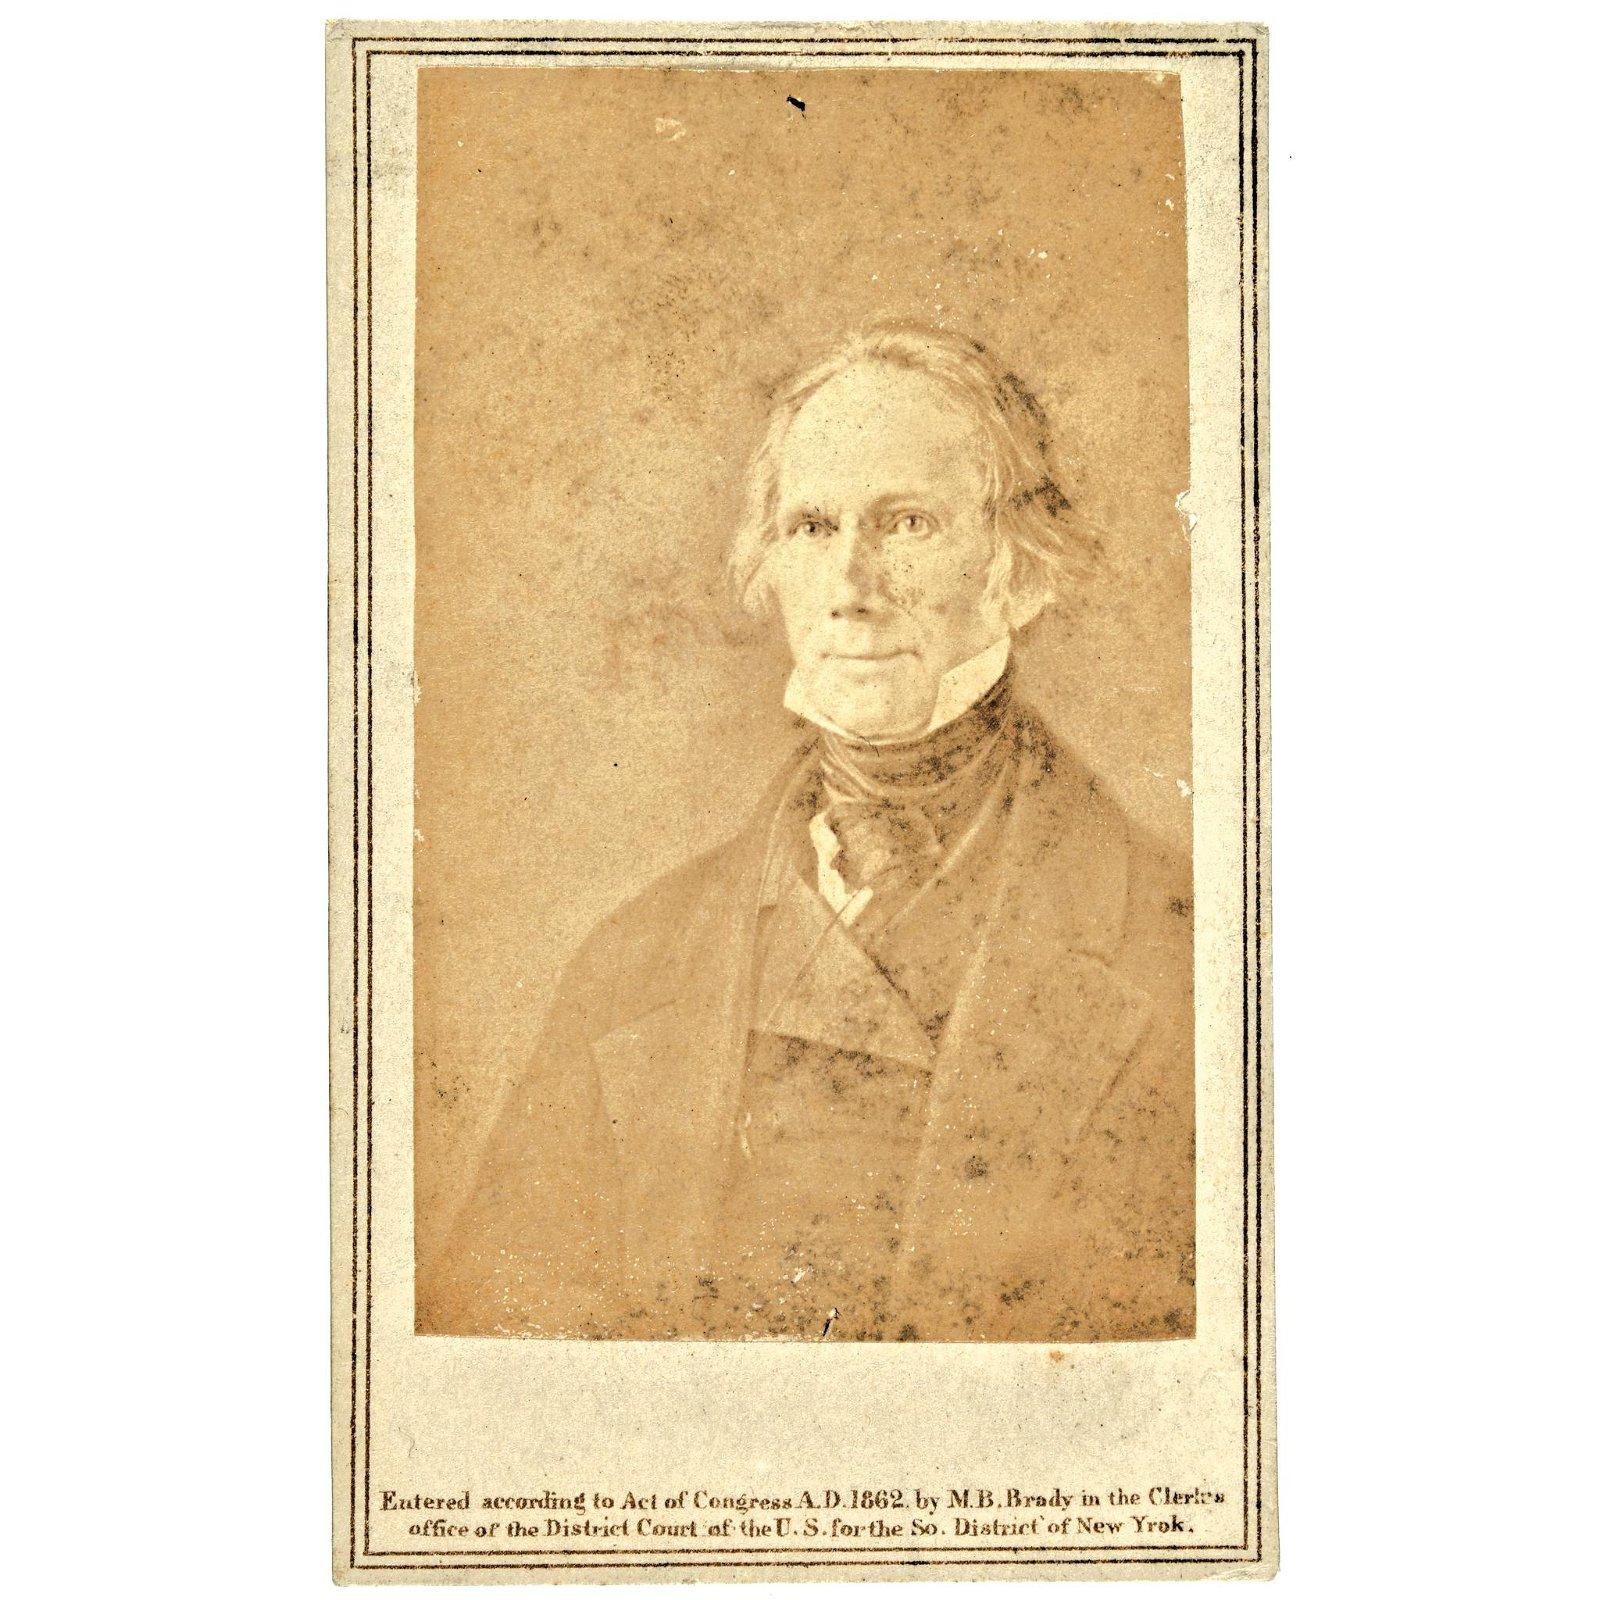 1862 CDV Photograph: Henry Clay by Mathew Brady